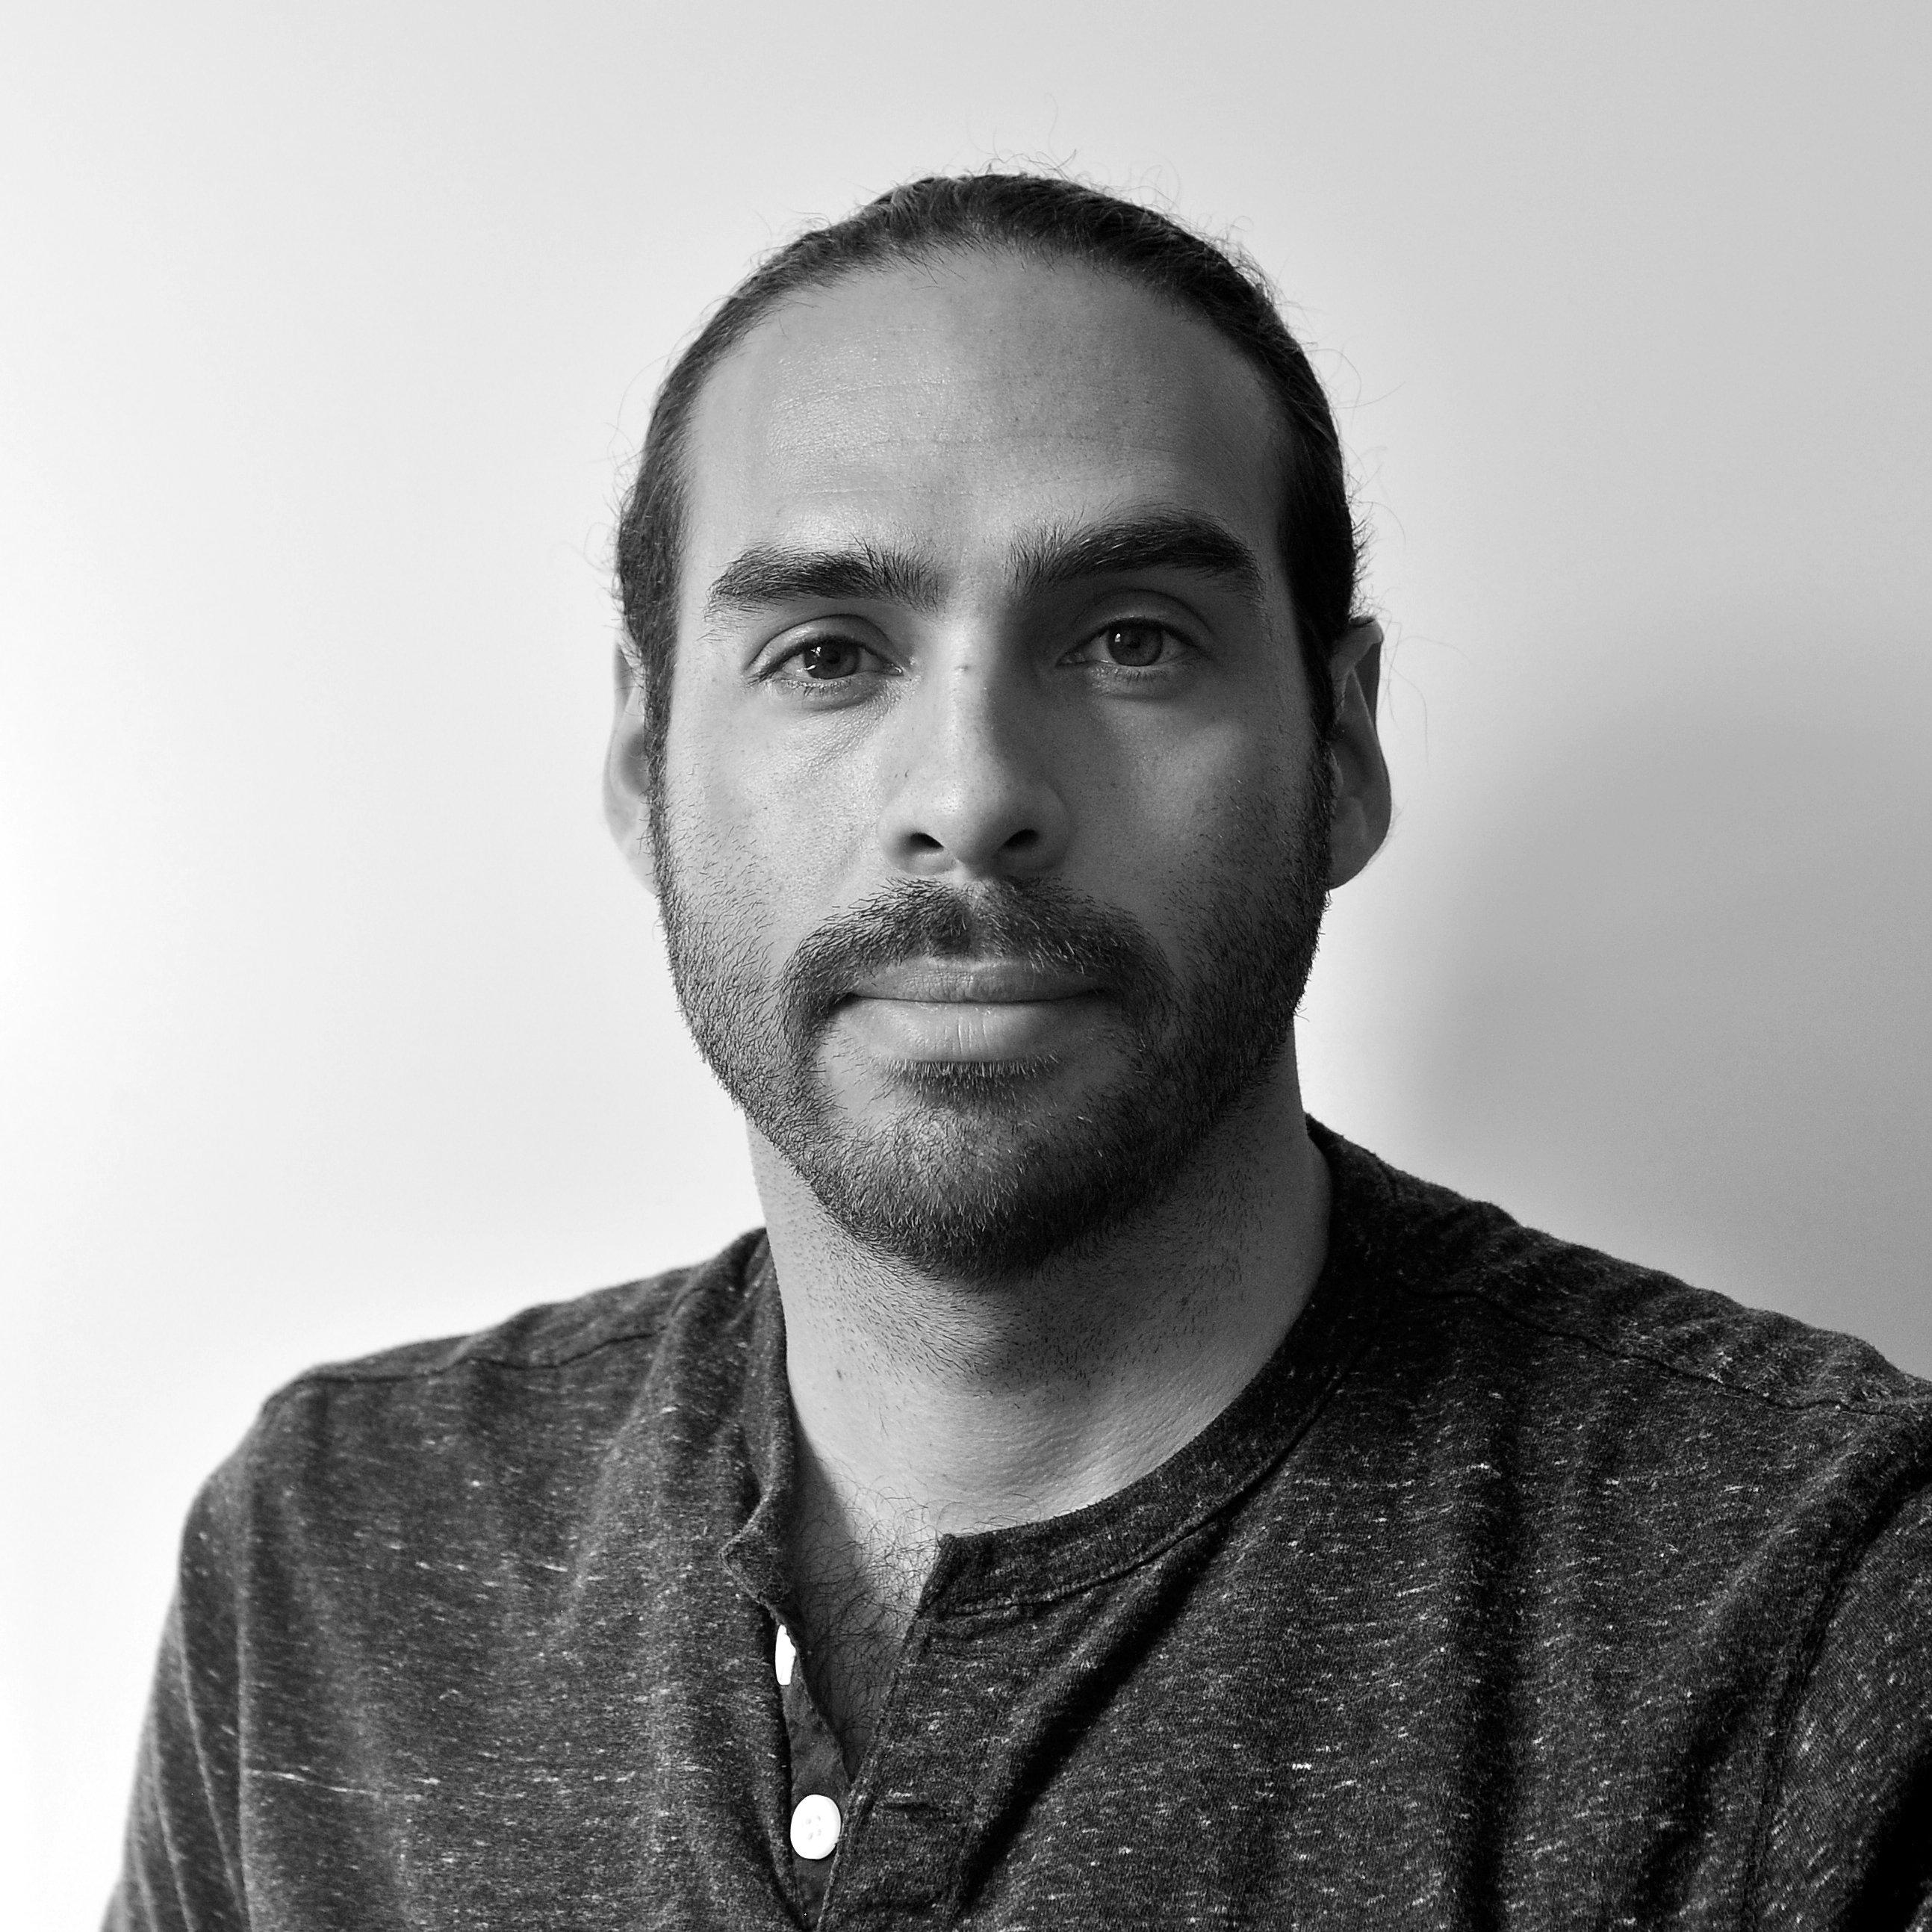 Miguel Horn